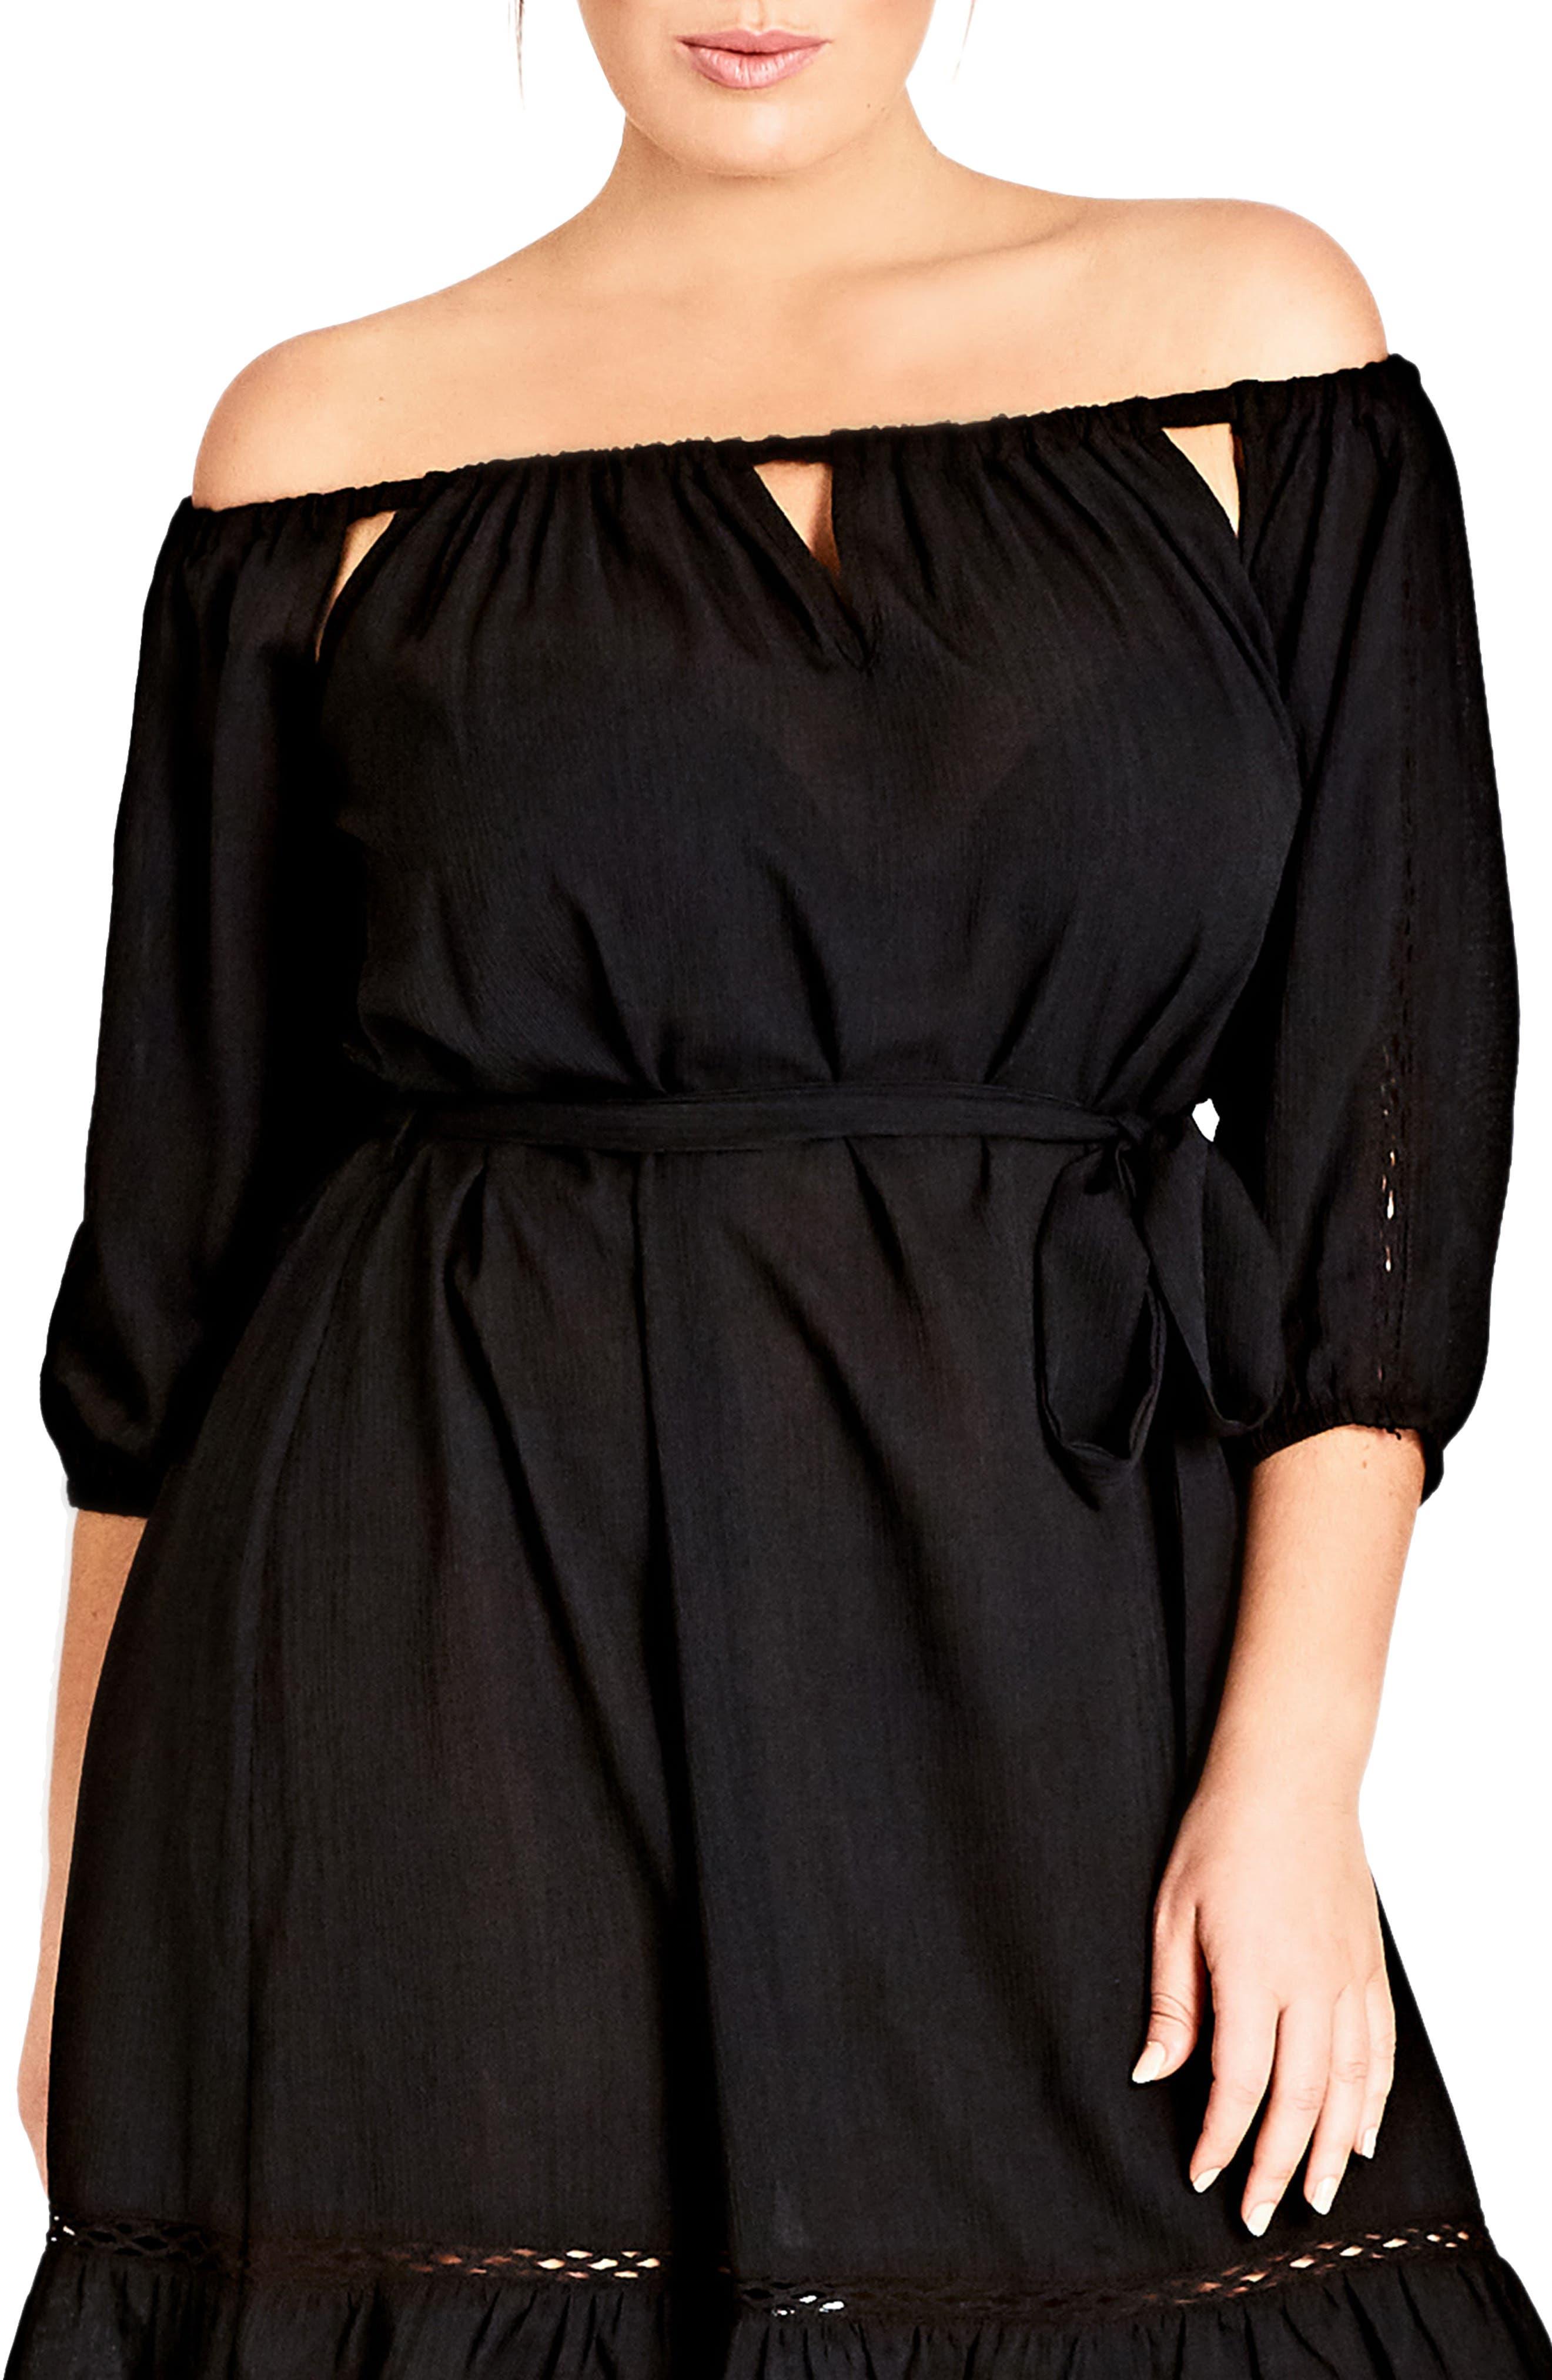 Plus Size City Chic Darling Diva Off The Shoulder Dress, Black